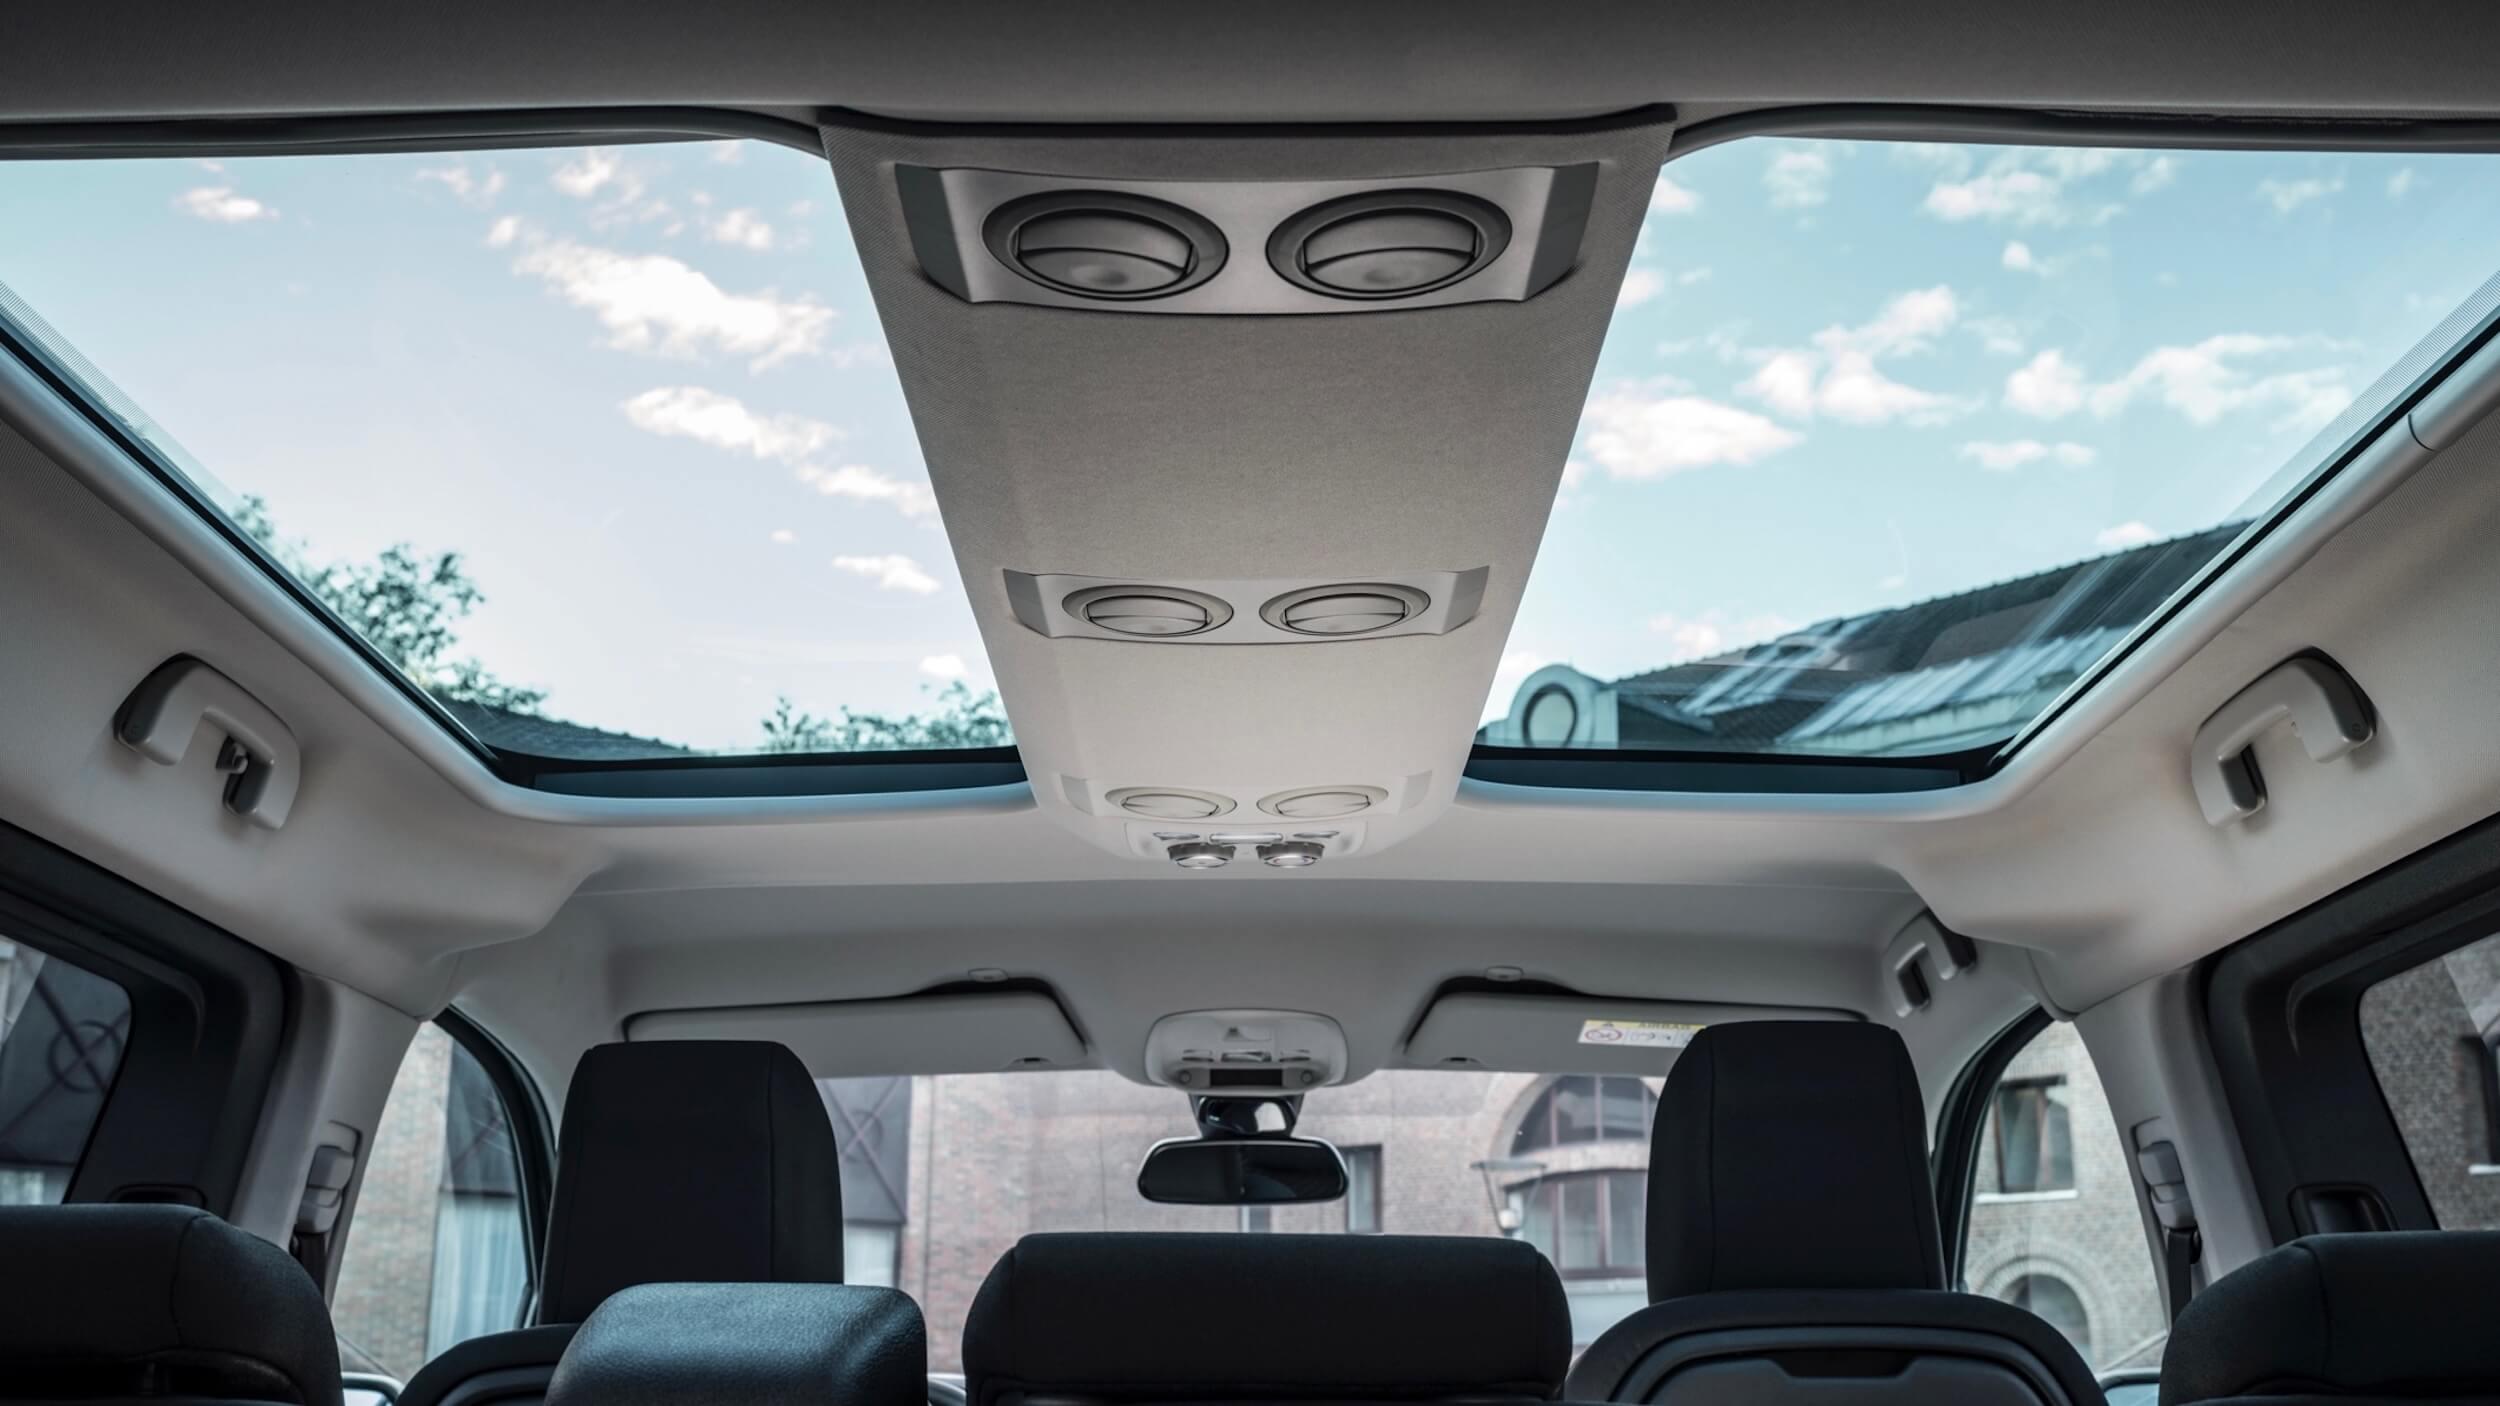 Toyota Proace Verso Electric glazen dak